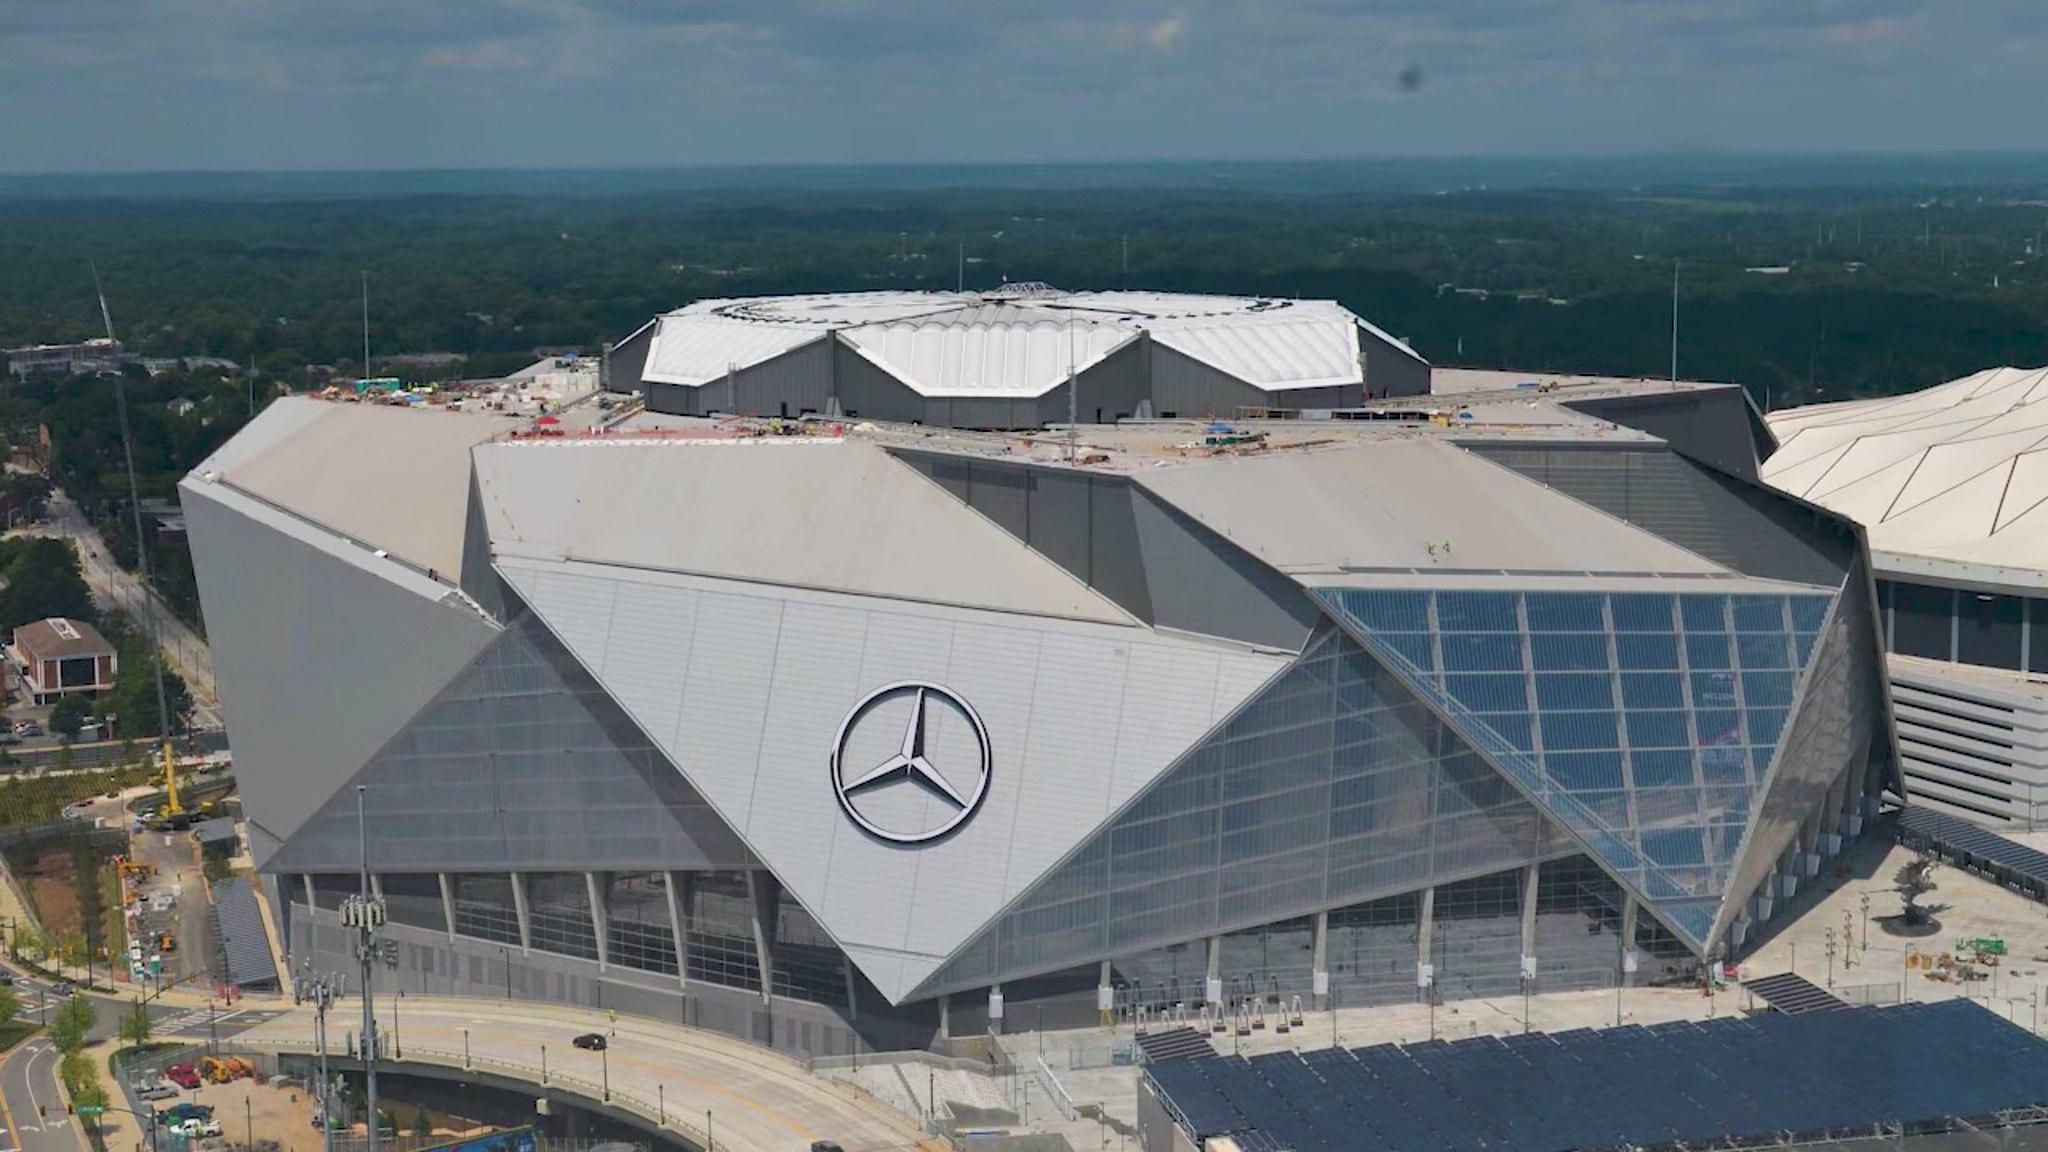 Super Bowl LIII at Mercedes-Benz Stadium in downtown Atlanta.